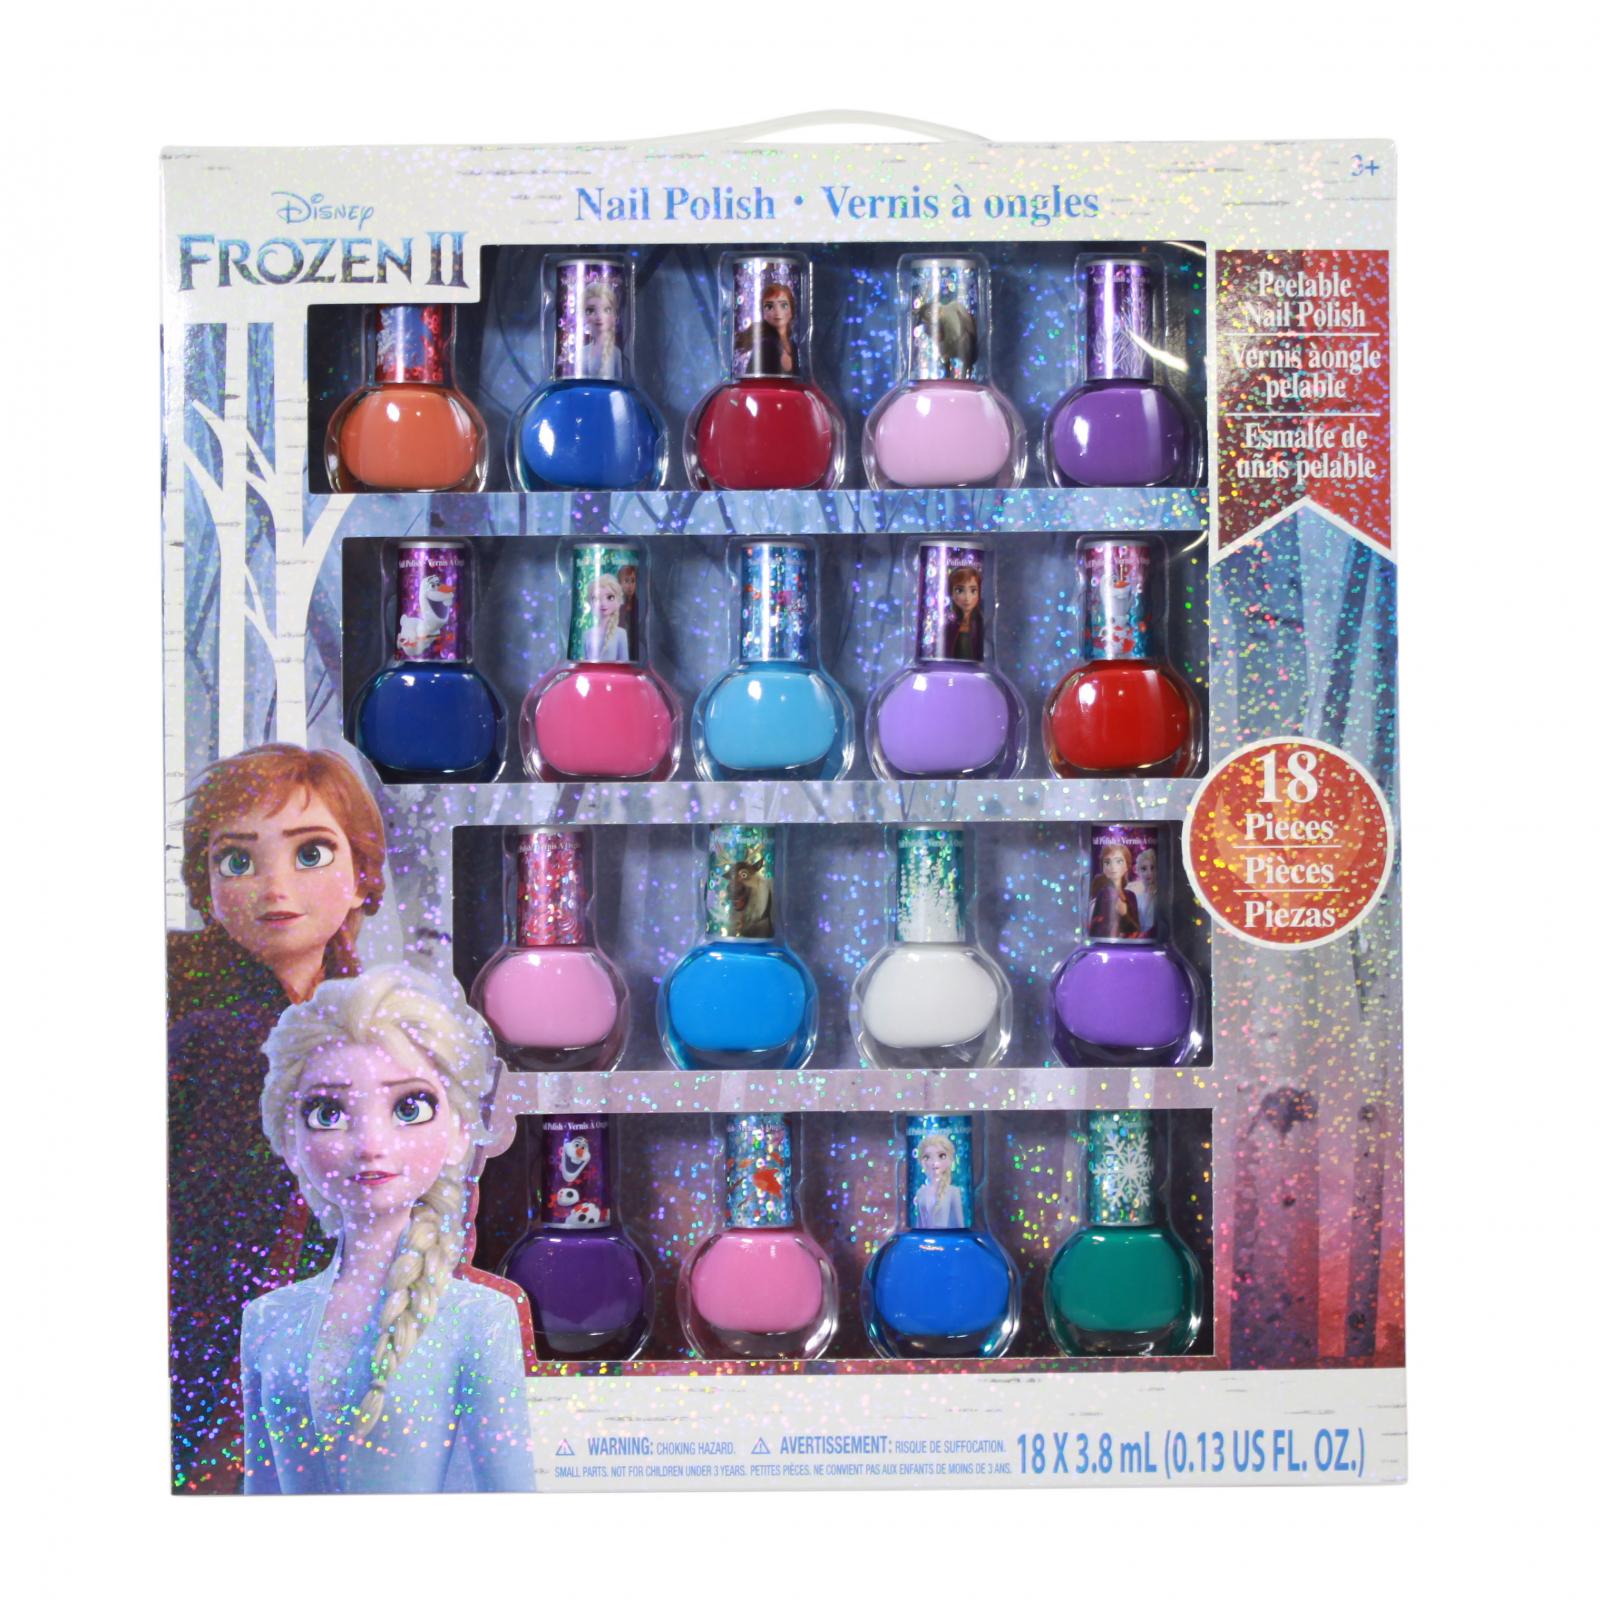 Disney Frozen 2 Girls Deluxe Nail Polish Gift Set 18 Pieces